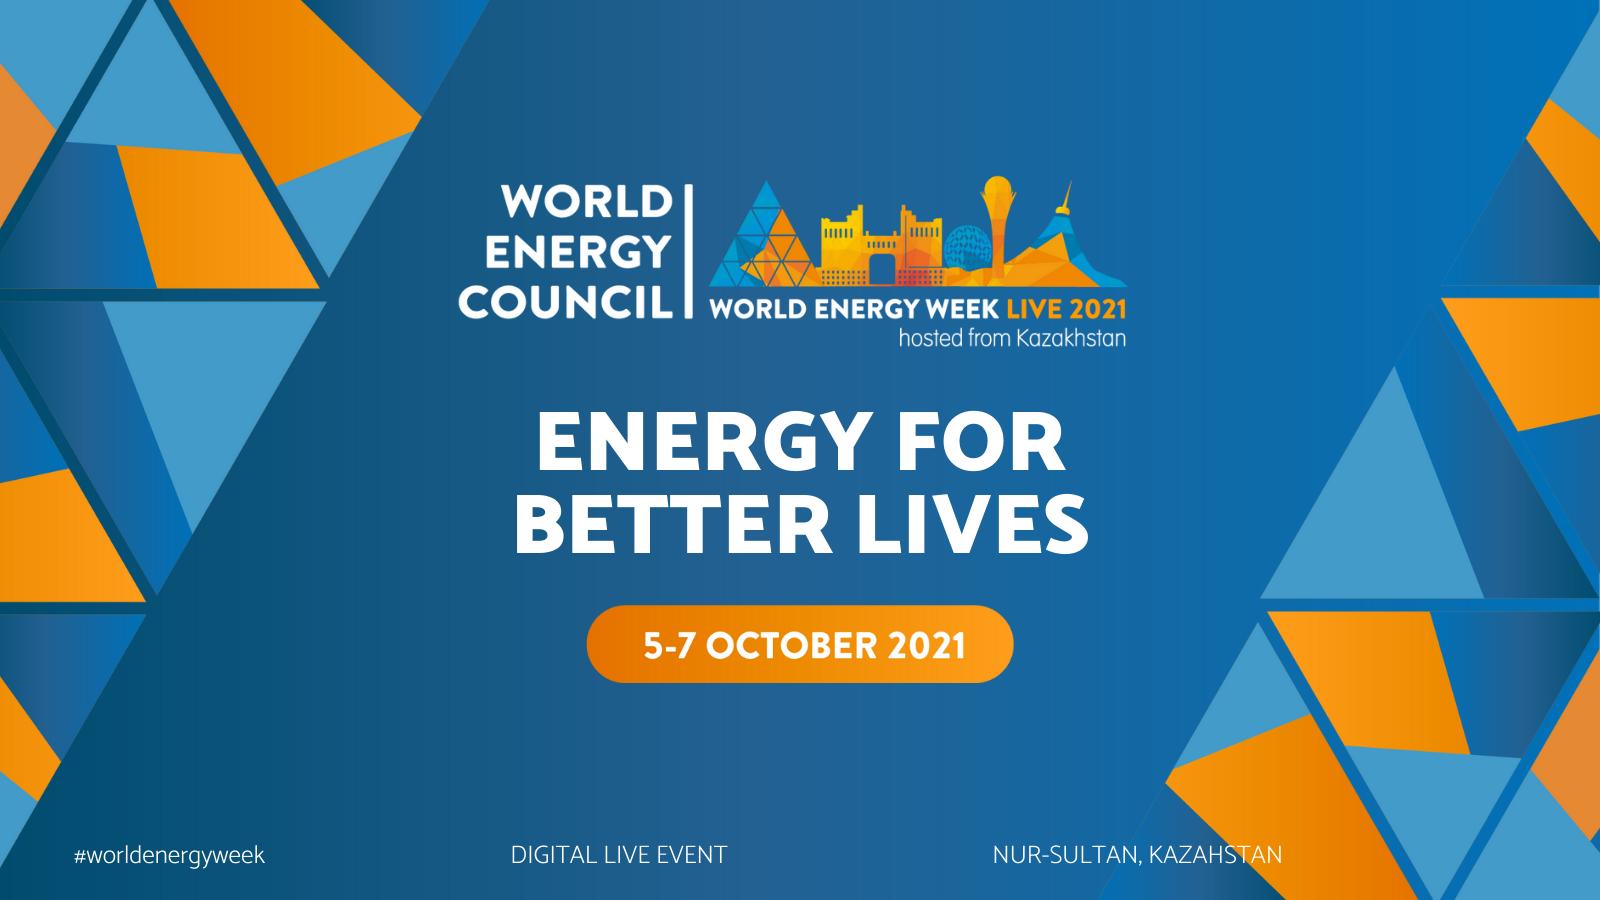 World Energy Week LIVE 2021